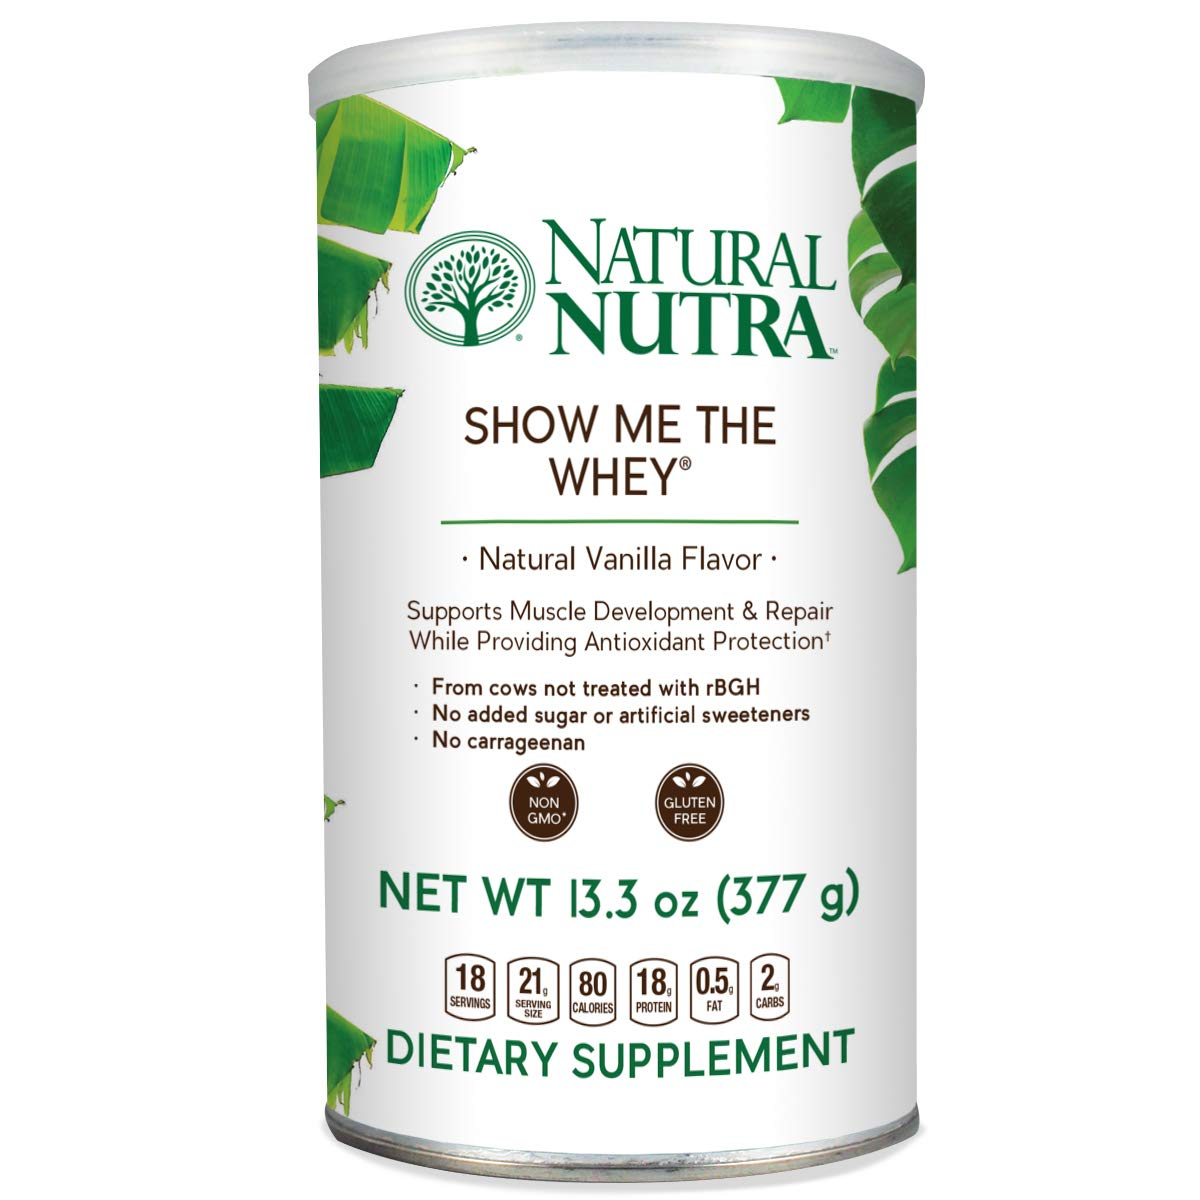 Natural Nutra Grass Fed Vanilla Whey Protein Isolate Powder, Best Tasting Amazing Flavor, Free Range, Gluten Free, Sugar Free, Non GMO, Show Me The Whey Protein Powder, 13.3oz